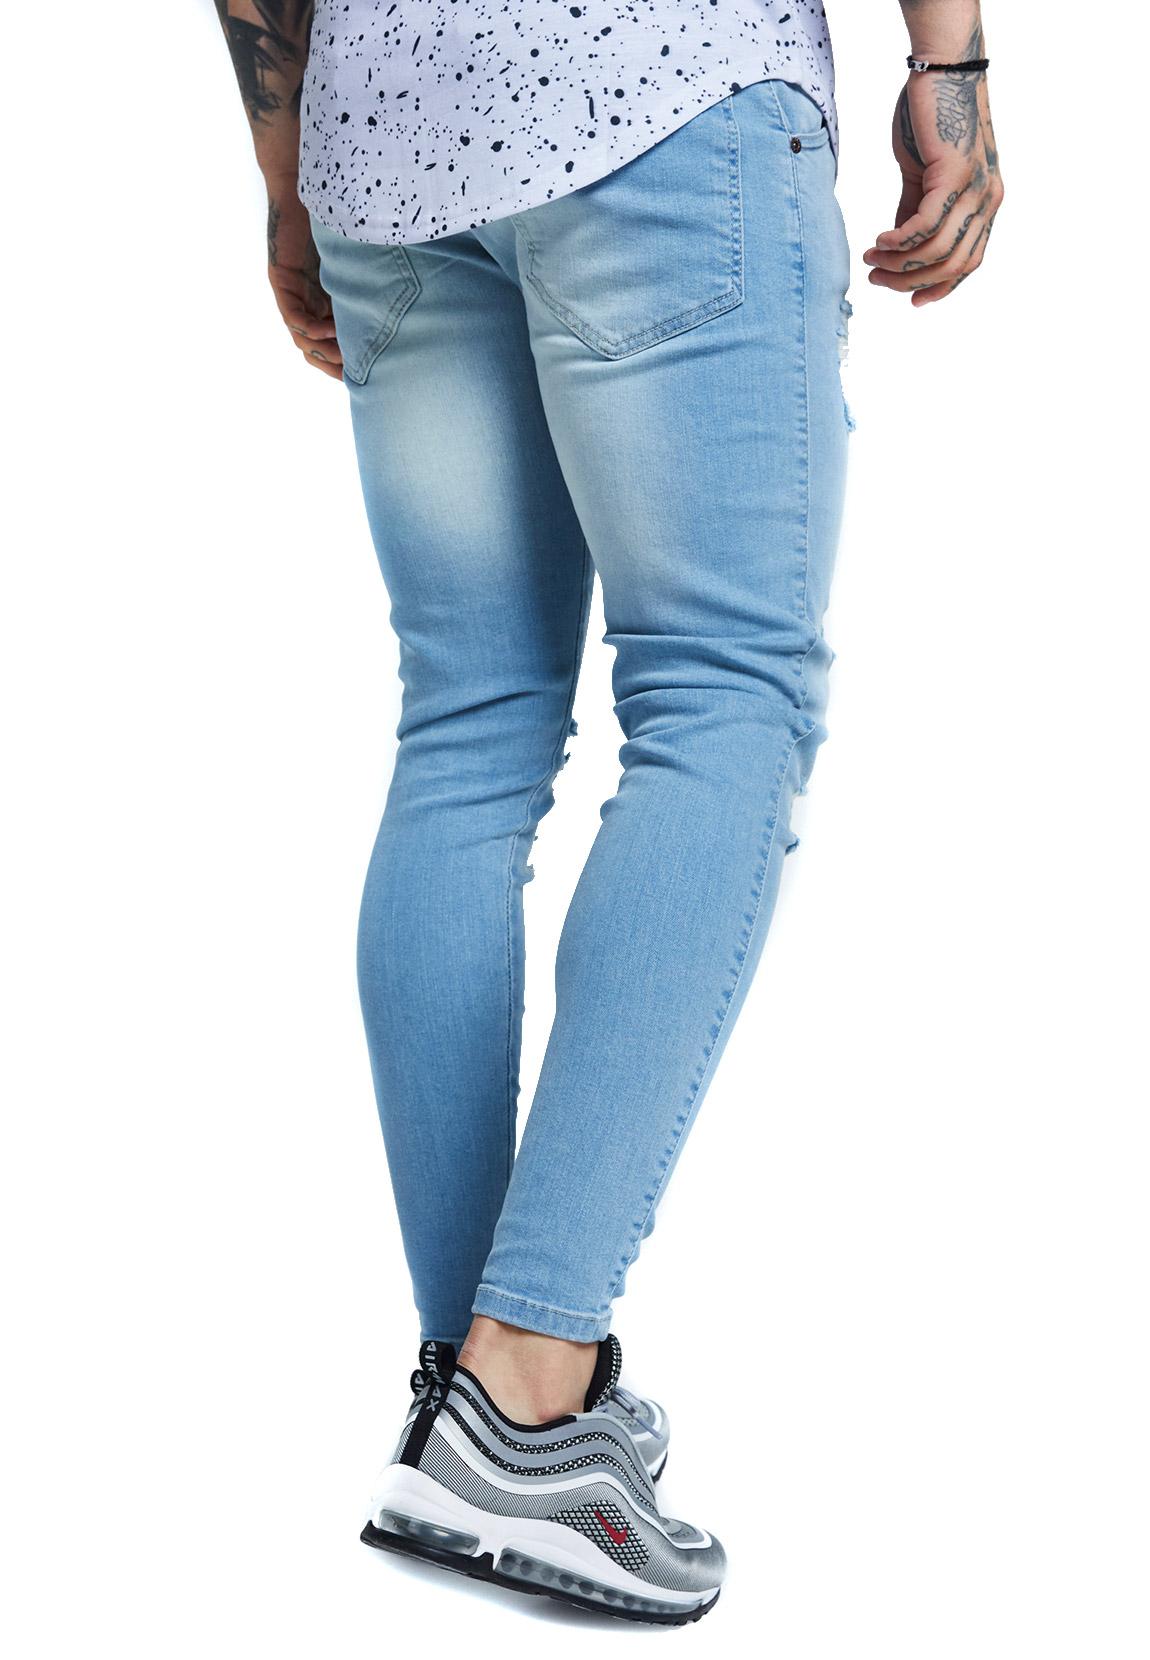 SikSilk Herren Jeans SKINNY DISTRESSED DENIM SS-12994 Hellblau Light Blue a1c9505dd9